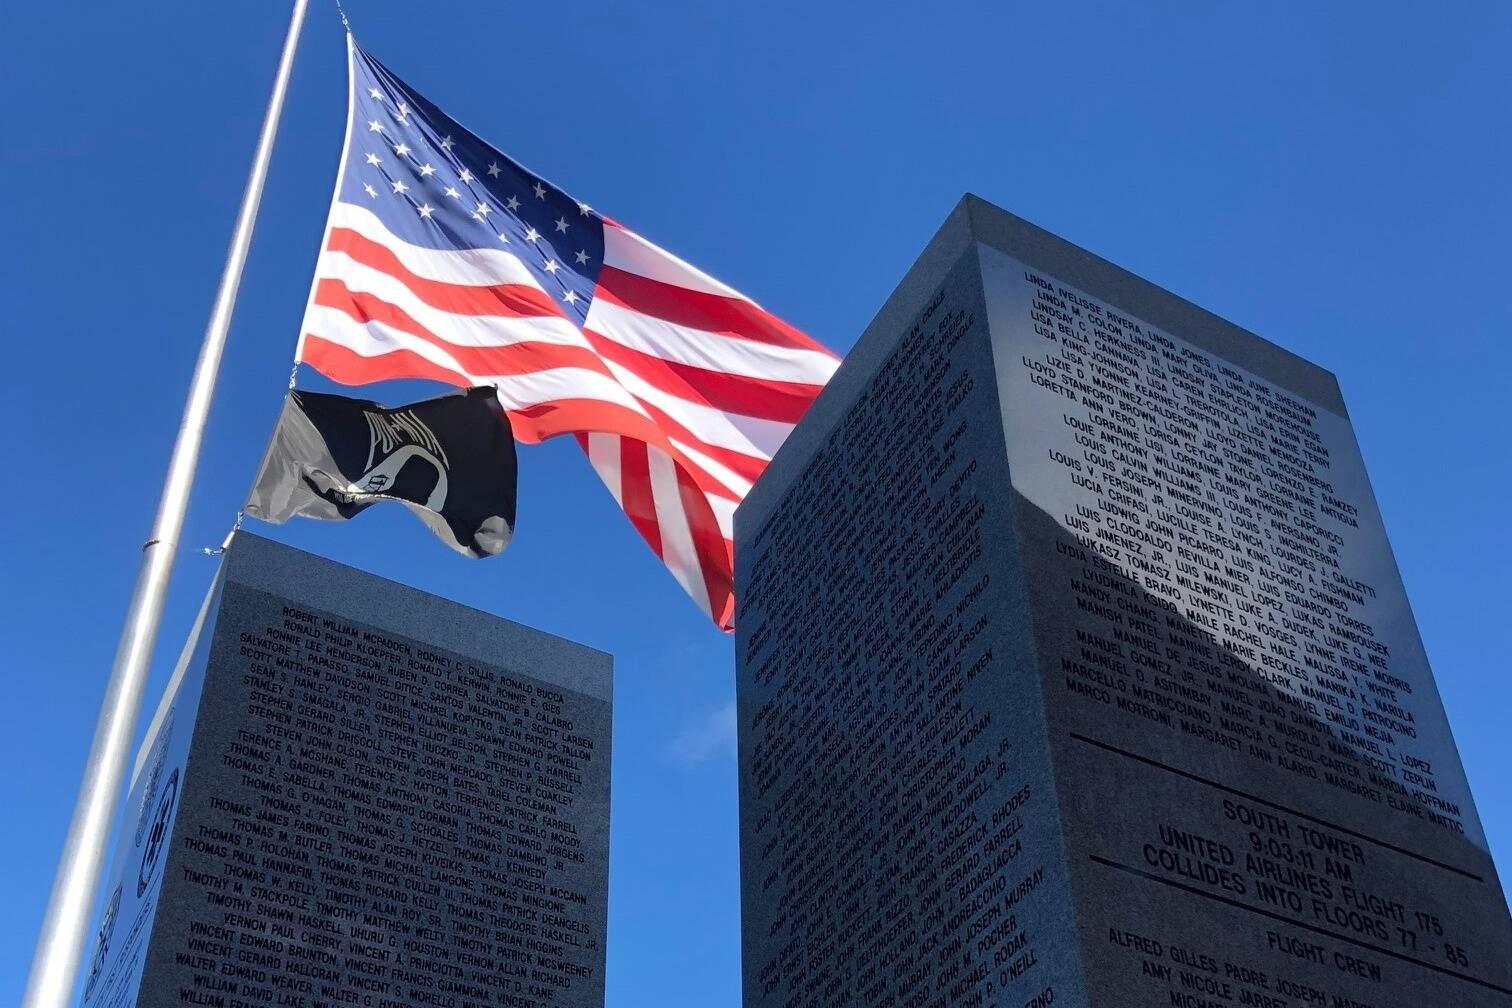 9/11 Memorial in Cashmere, Washington. Photo courtesy of Greg Asimakoupoulos